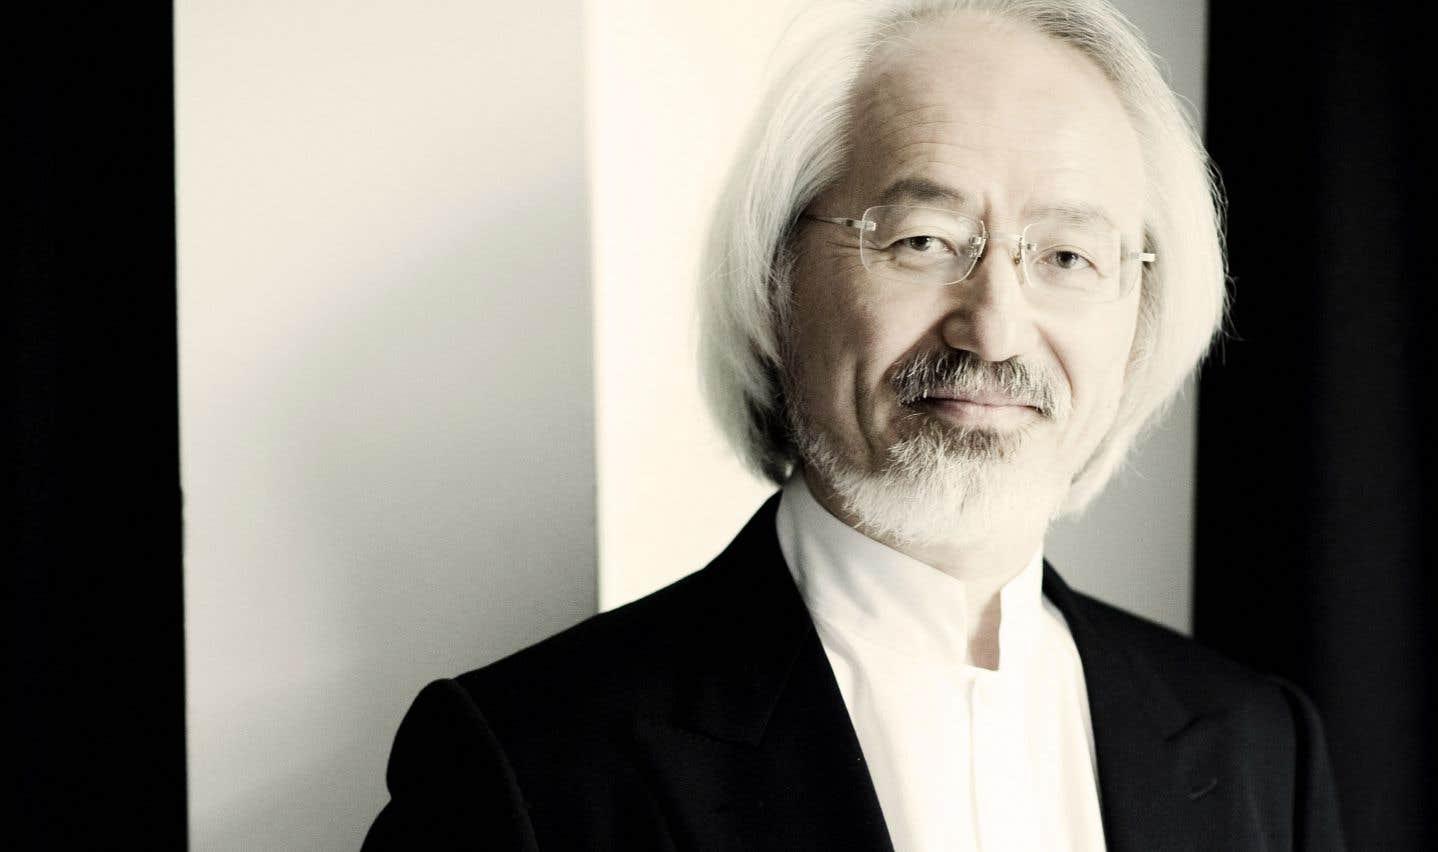 Le chef d'orchestre japonais Masaaki Suzuki